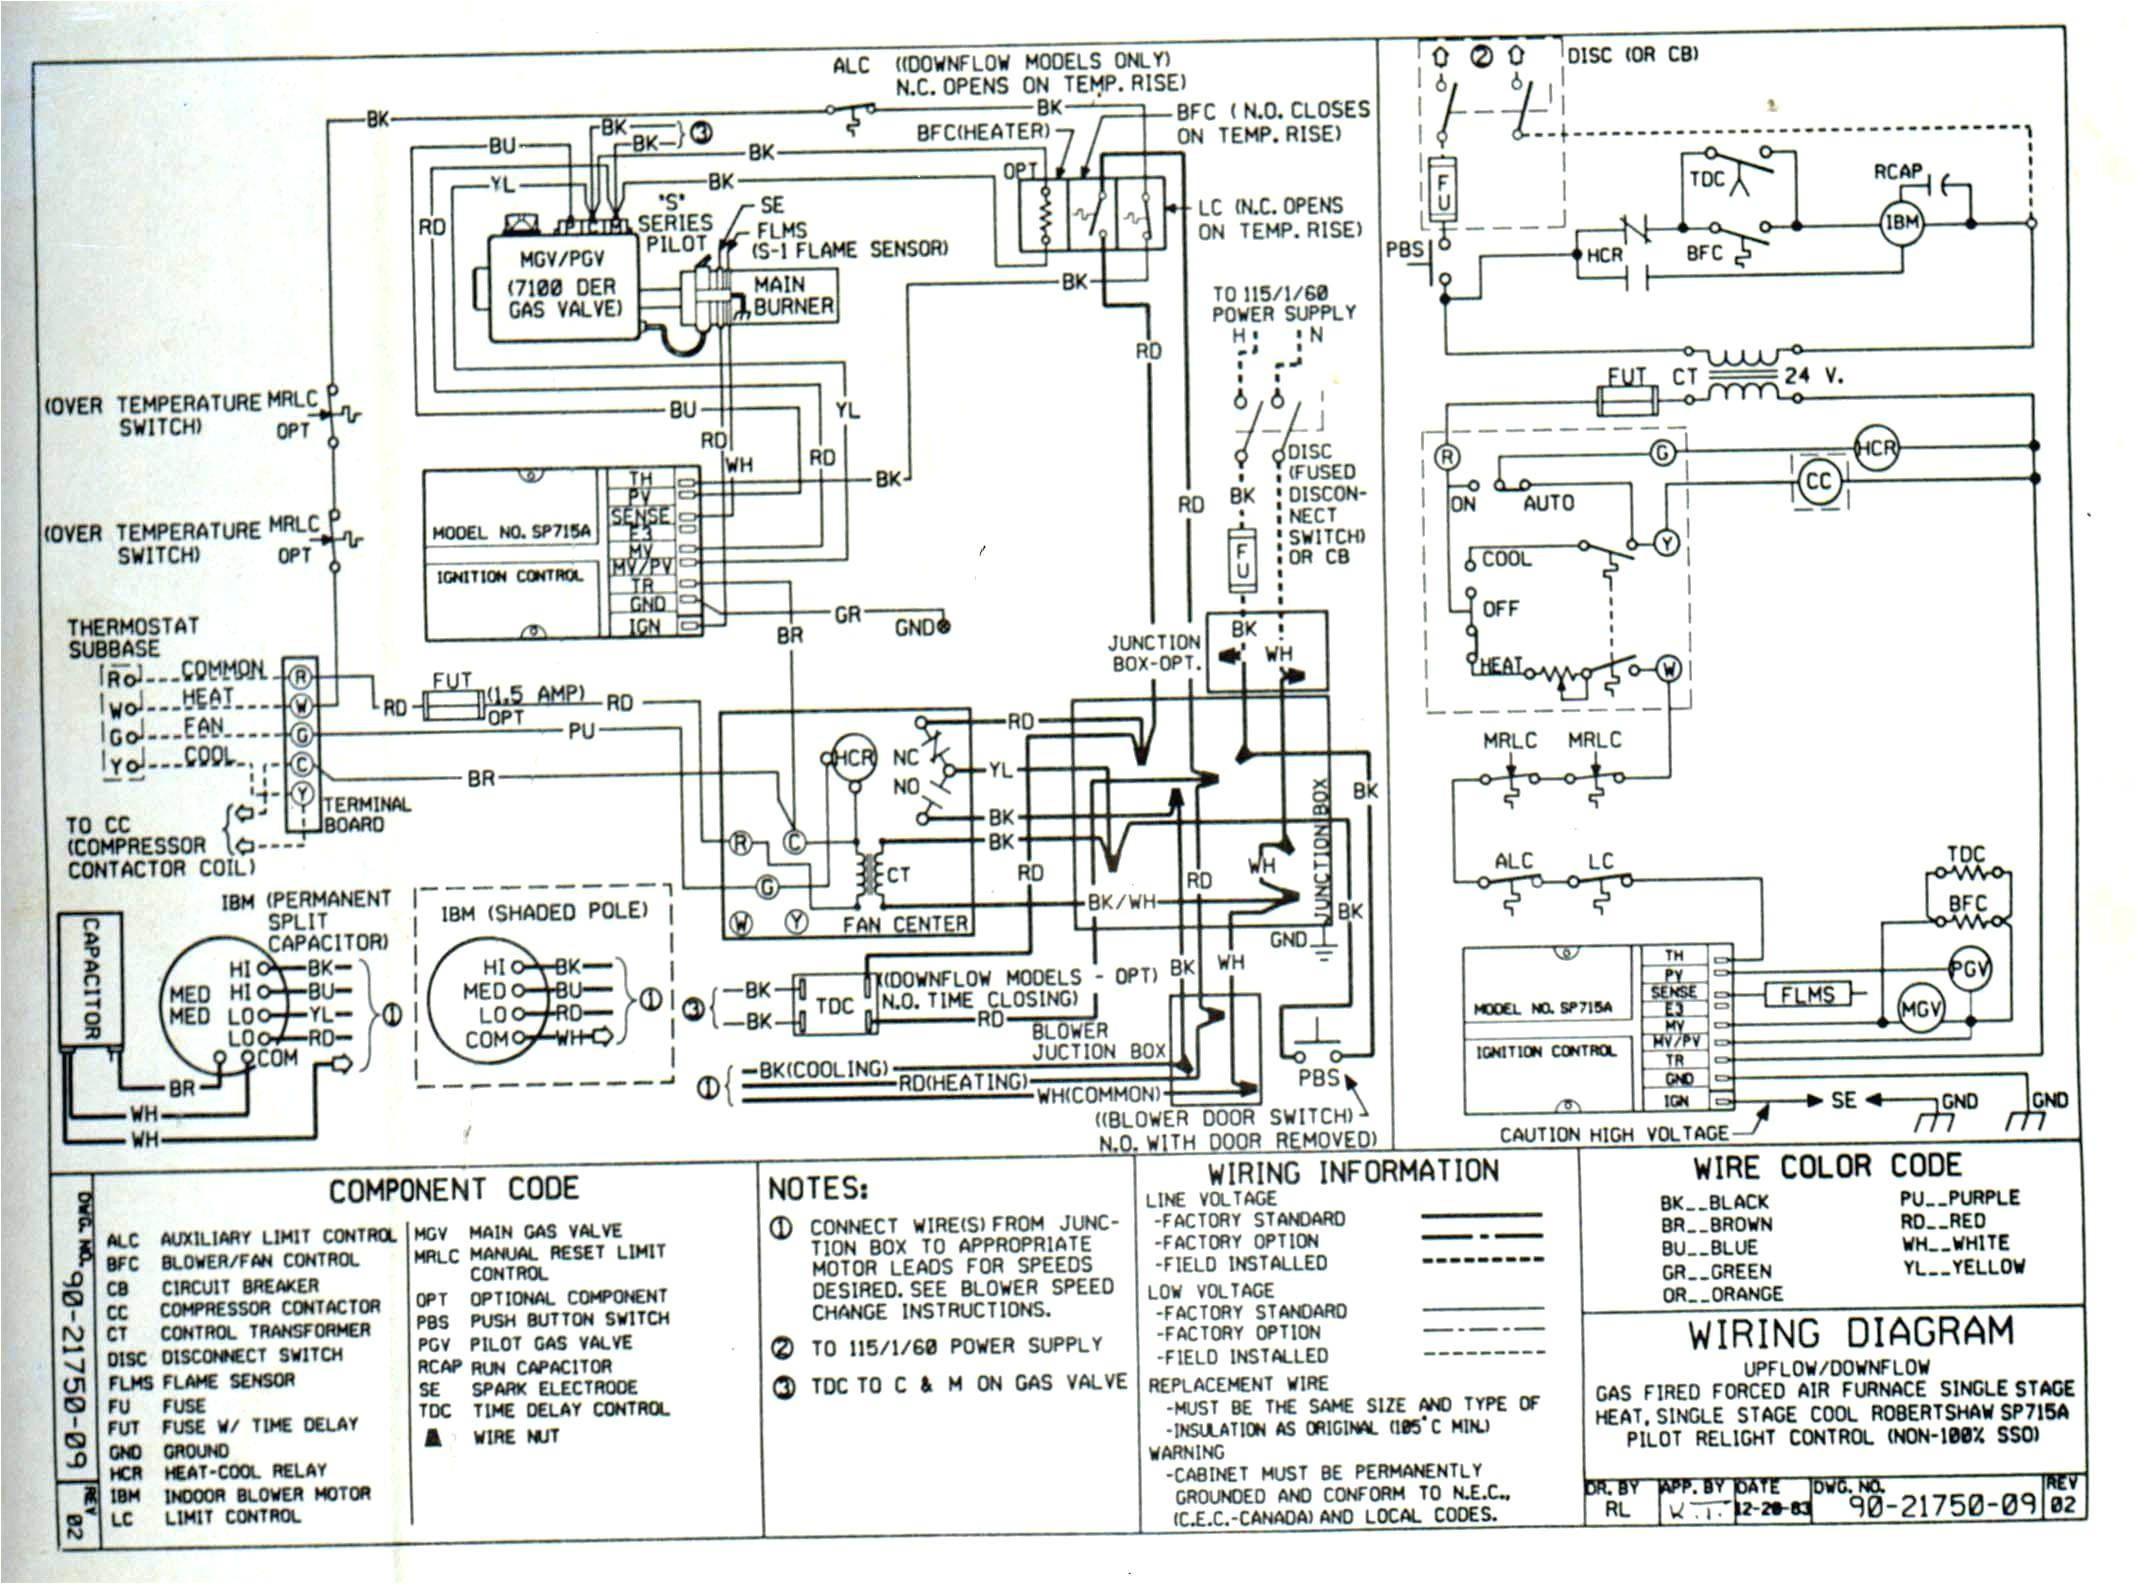 aaon rooftop units wiring diagram trane ac wiring diagram gallery wiring diagram rh visithoustontexas org crane schematic symbols carrier schematic symbols 3o jpg